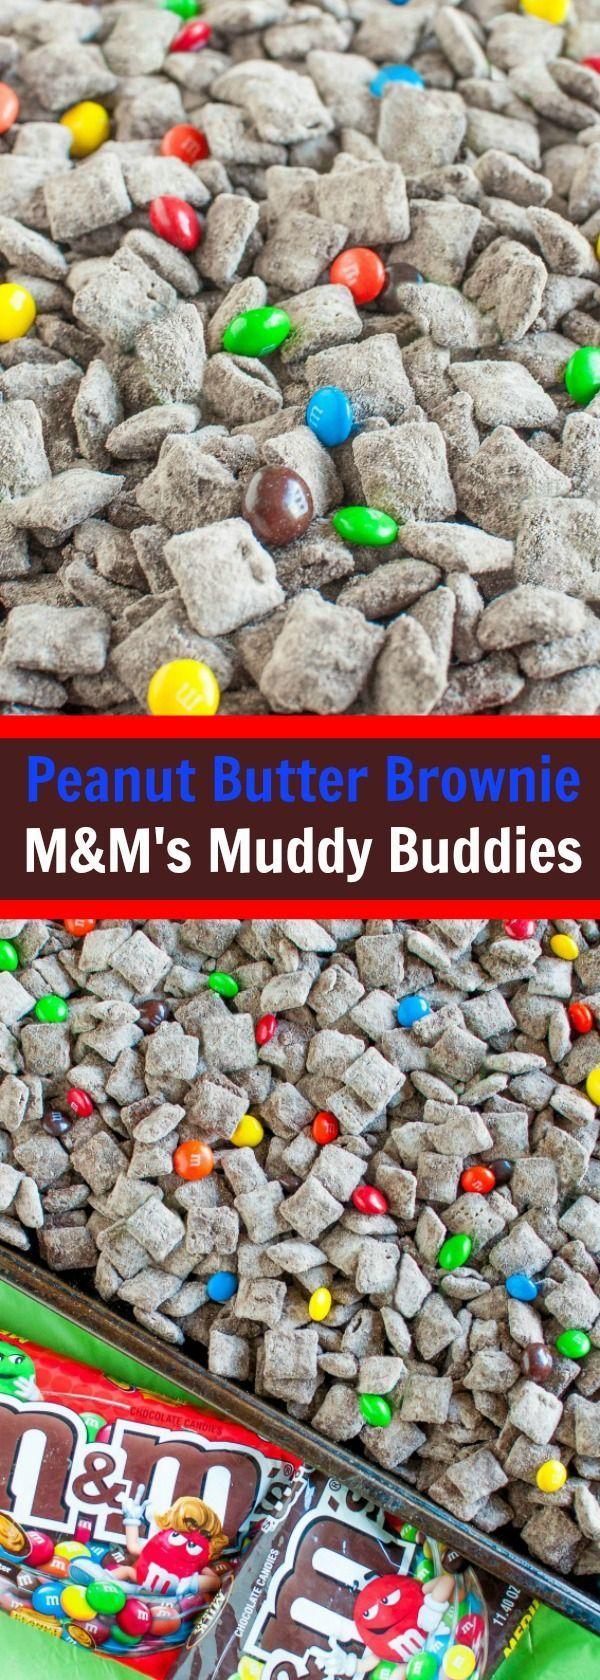 Peanut Butter BROWNIE M&M's Muddy Buddies!